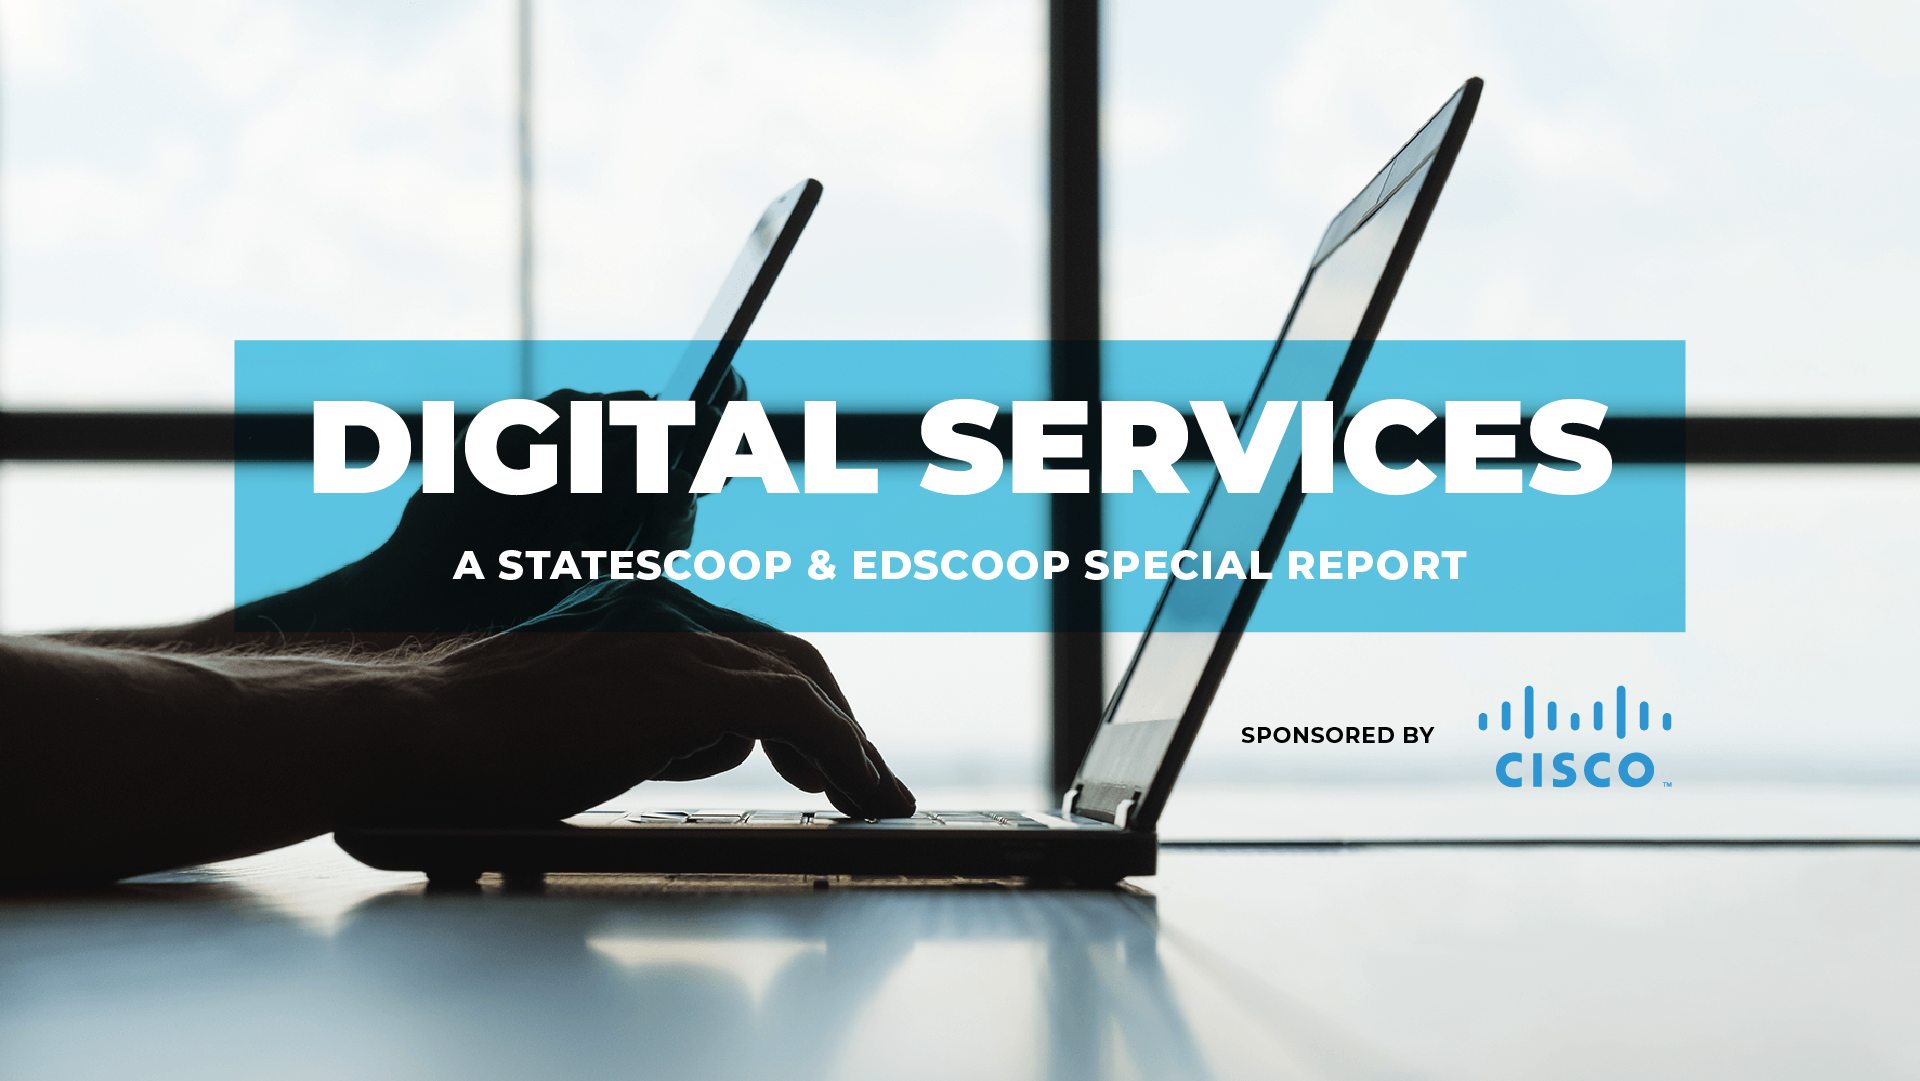 Digital Services — A StateScoop & EdScoop Special Report